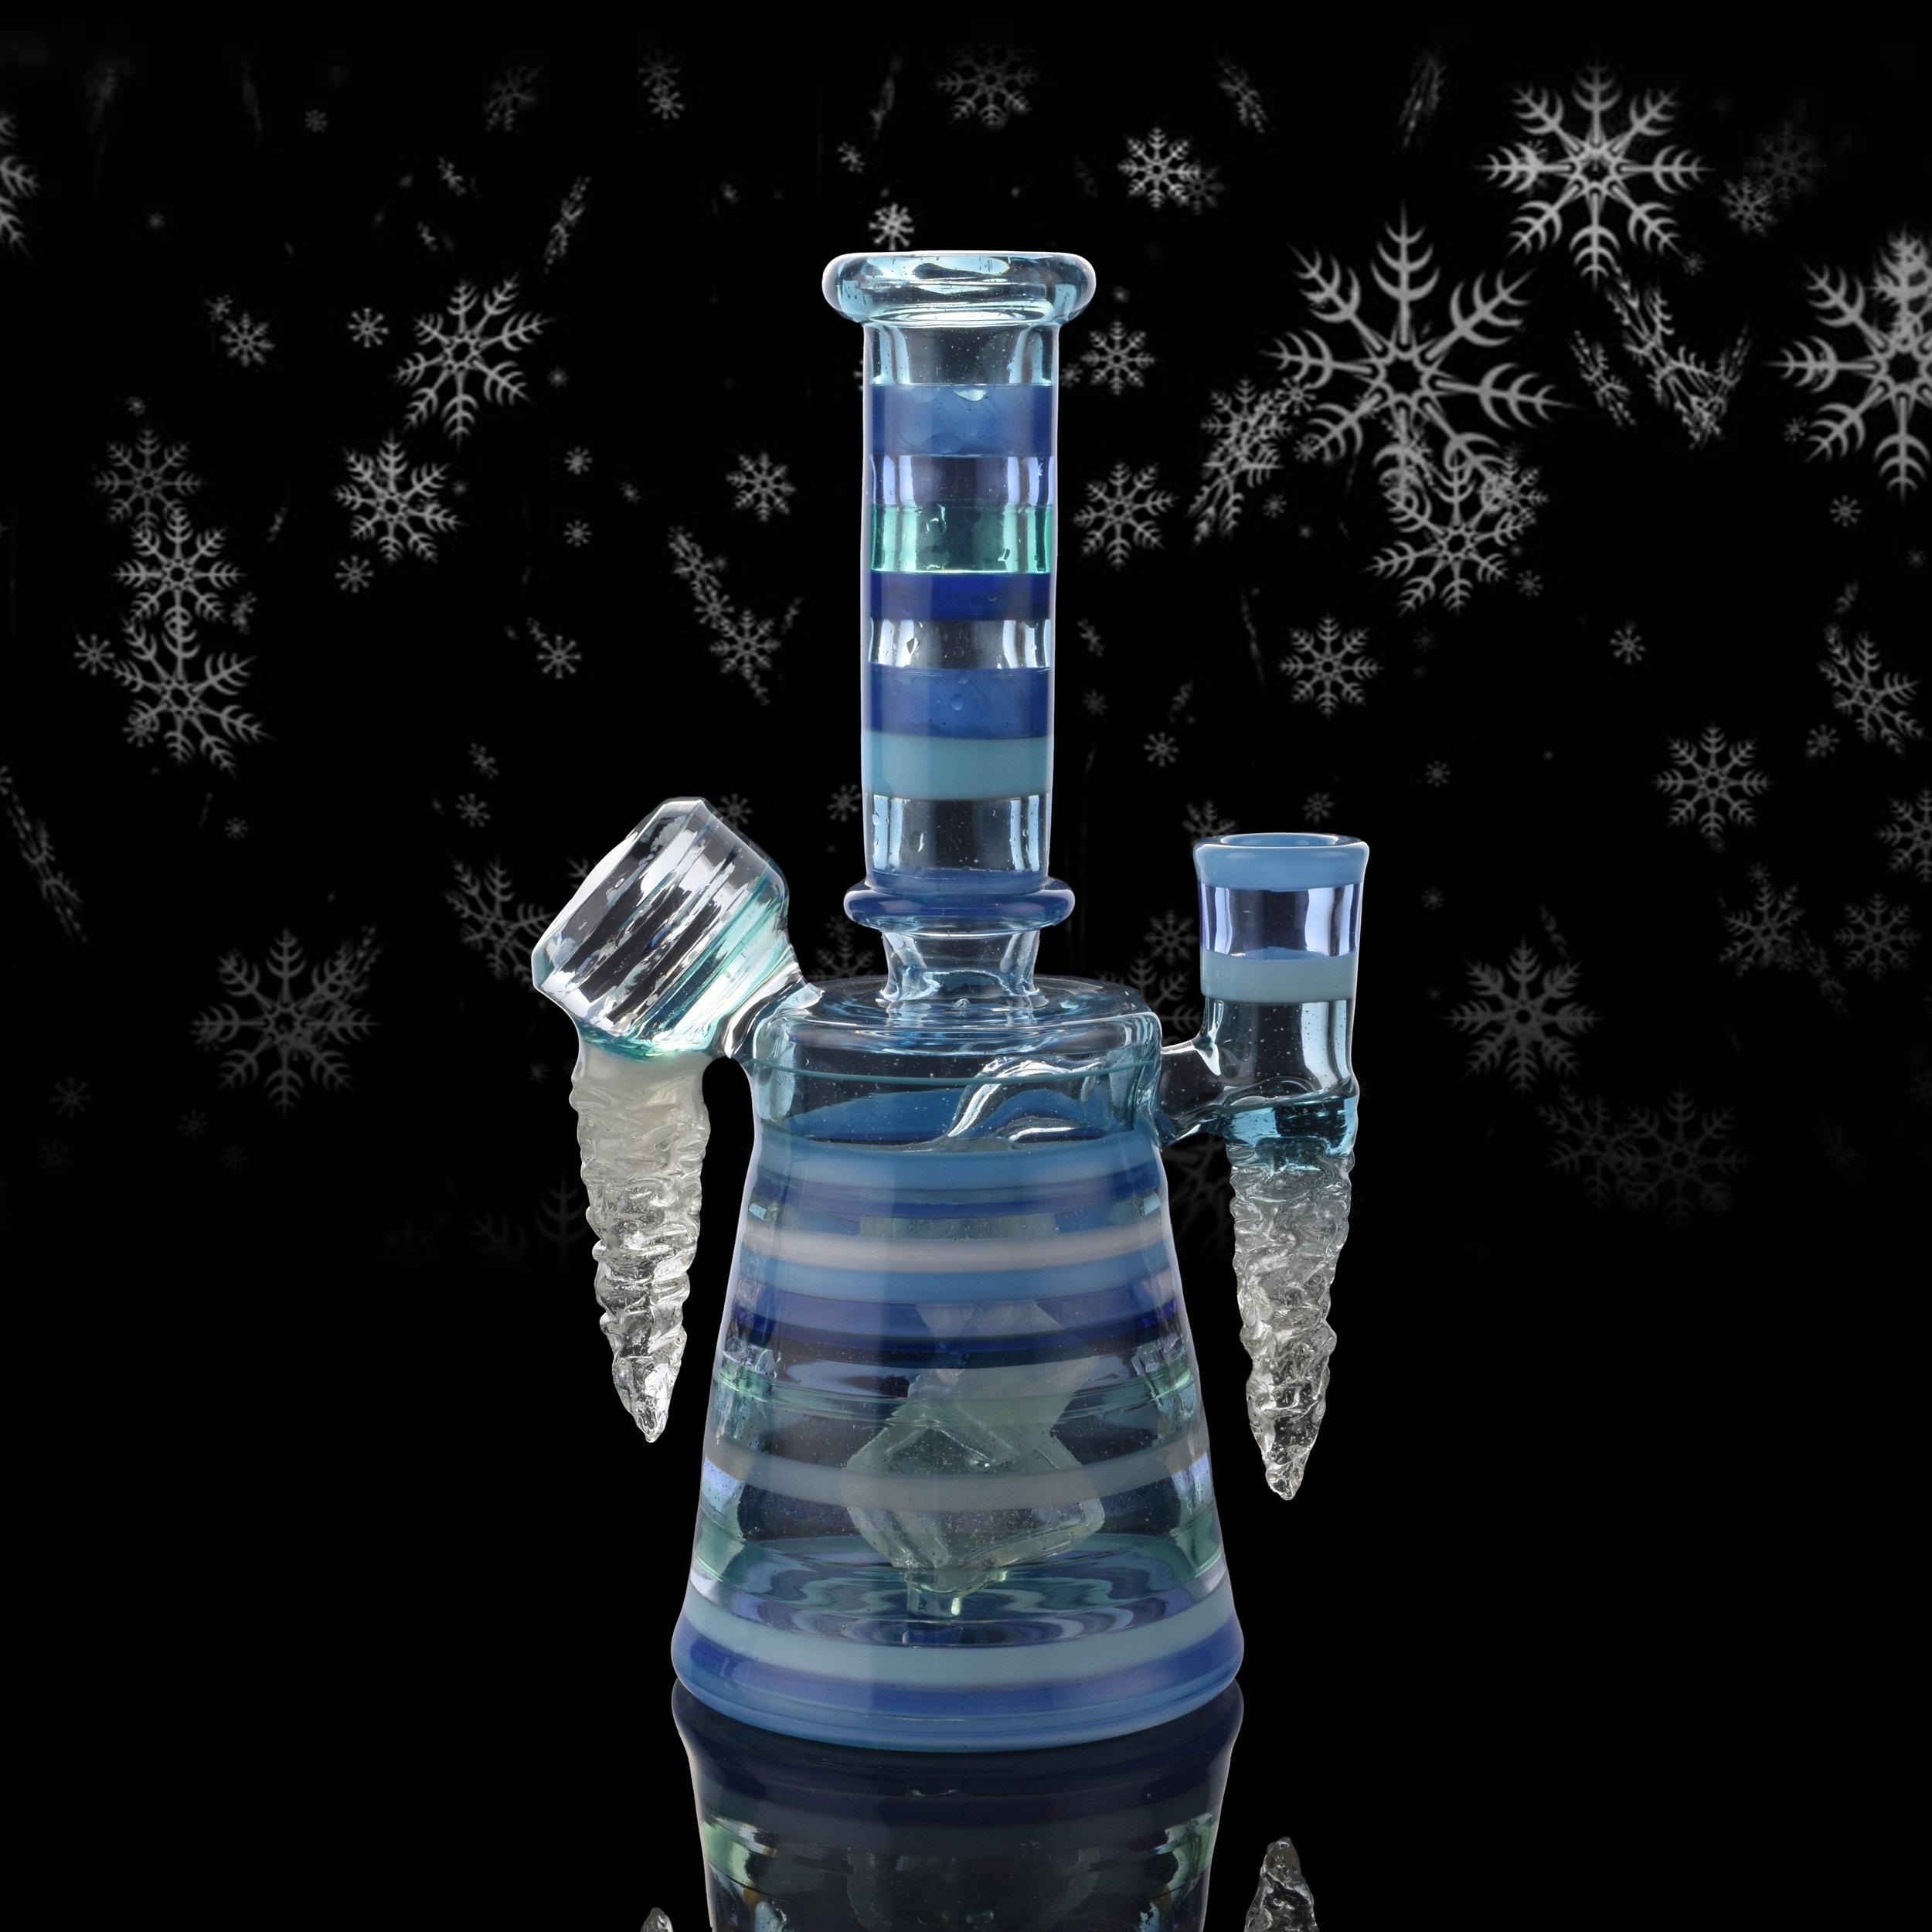 chaka ice tube snowflake background.jpg